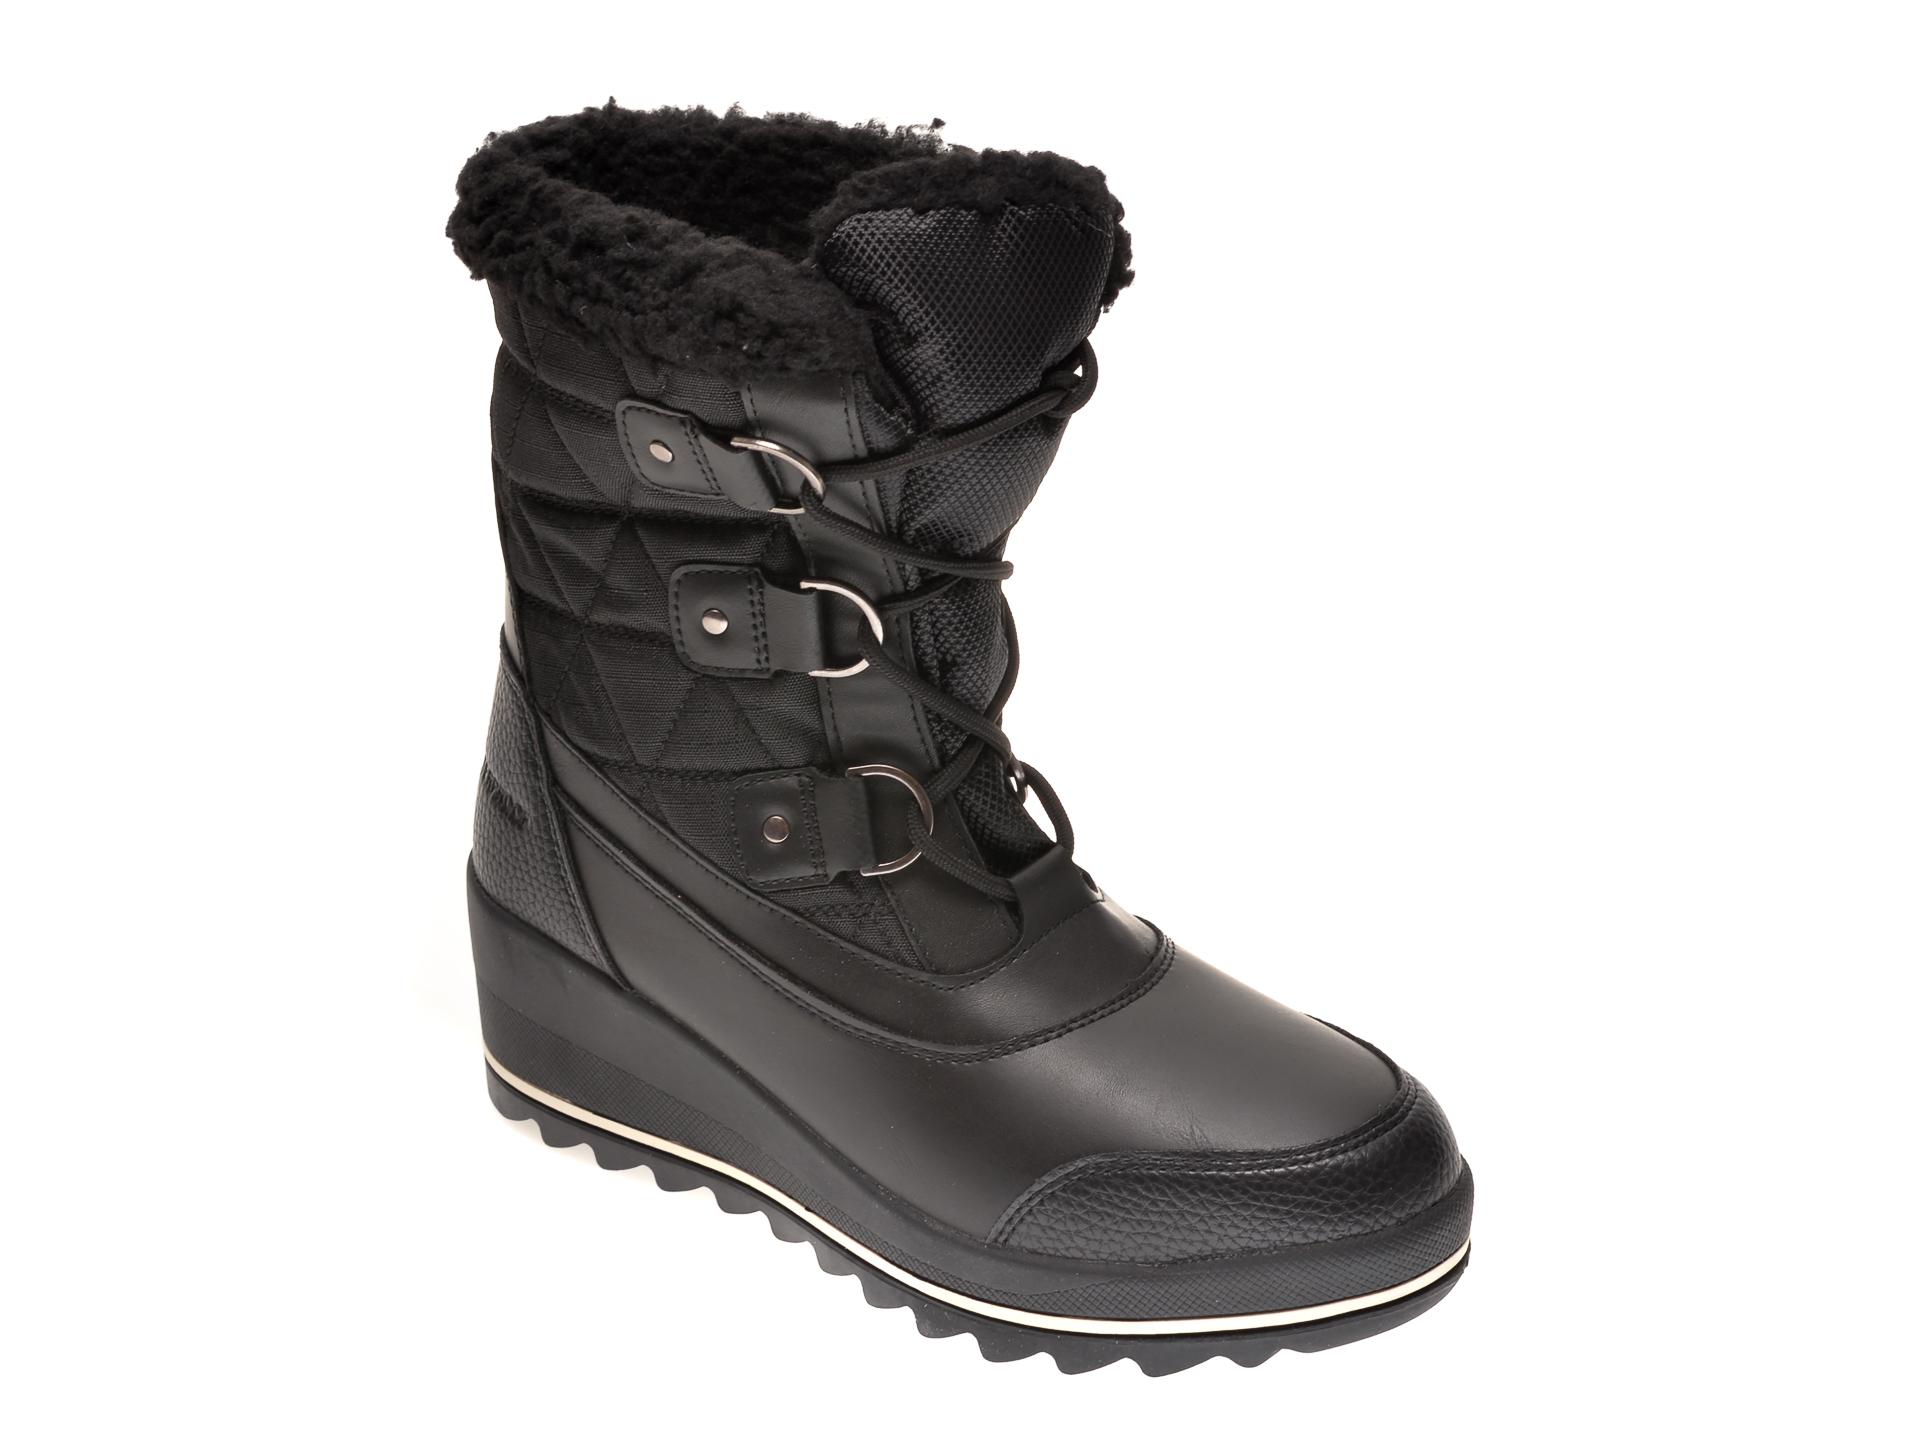 Ghete ALDO negre, Legelanna001, din material textil si piele ecologica